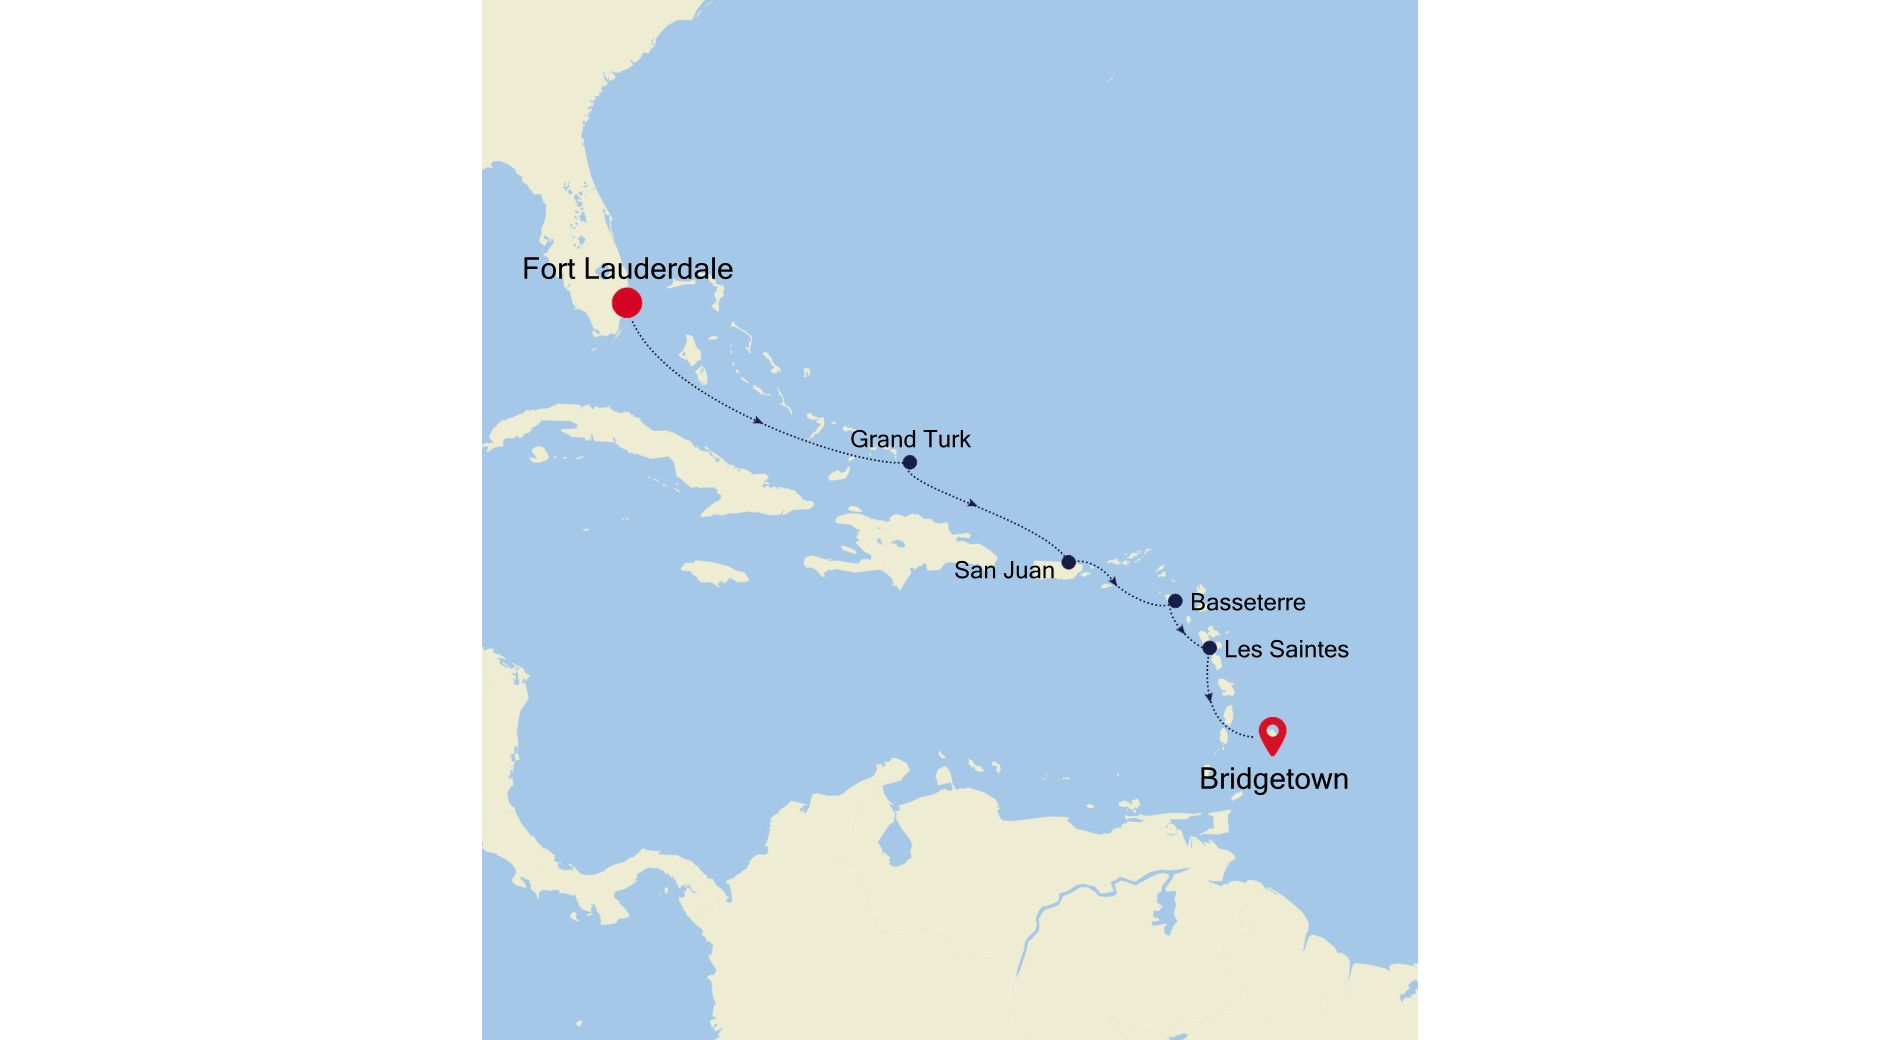 4930A - Fort Lauderdale to Bridgetown